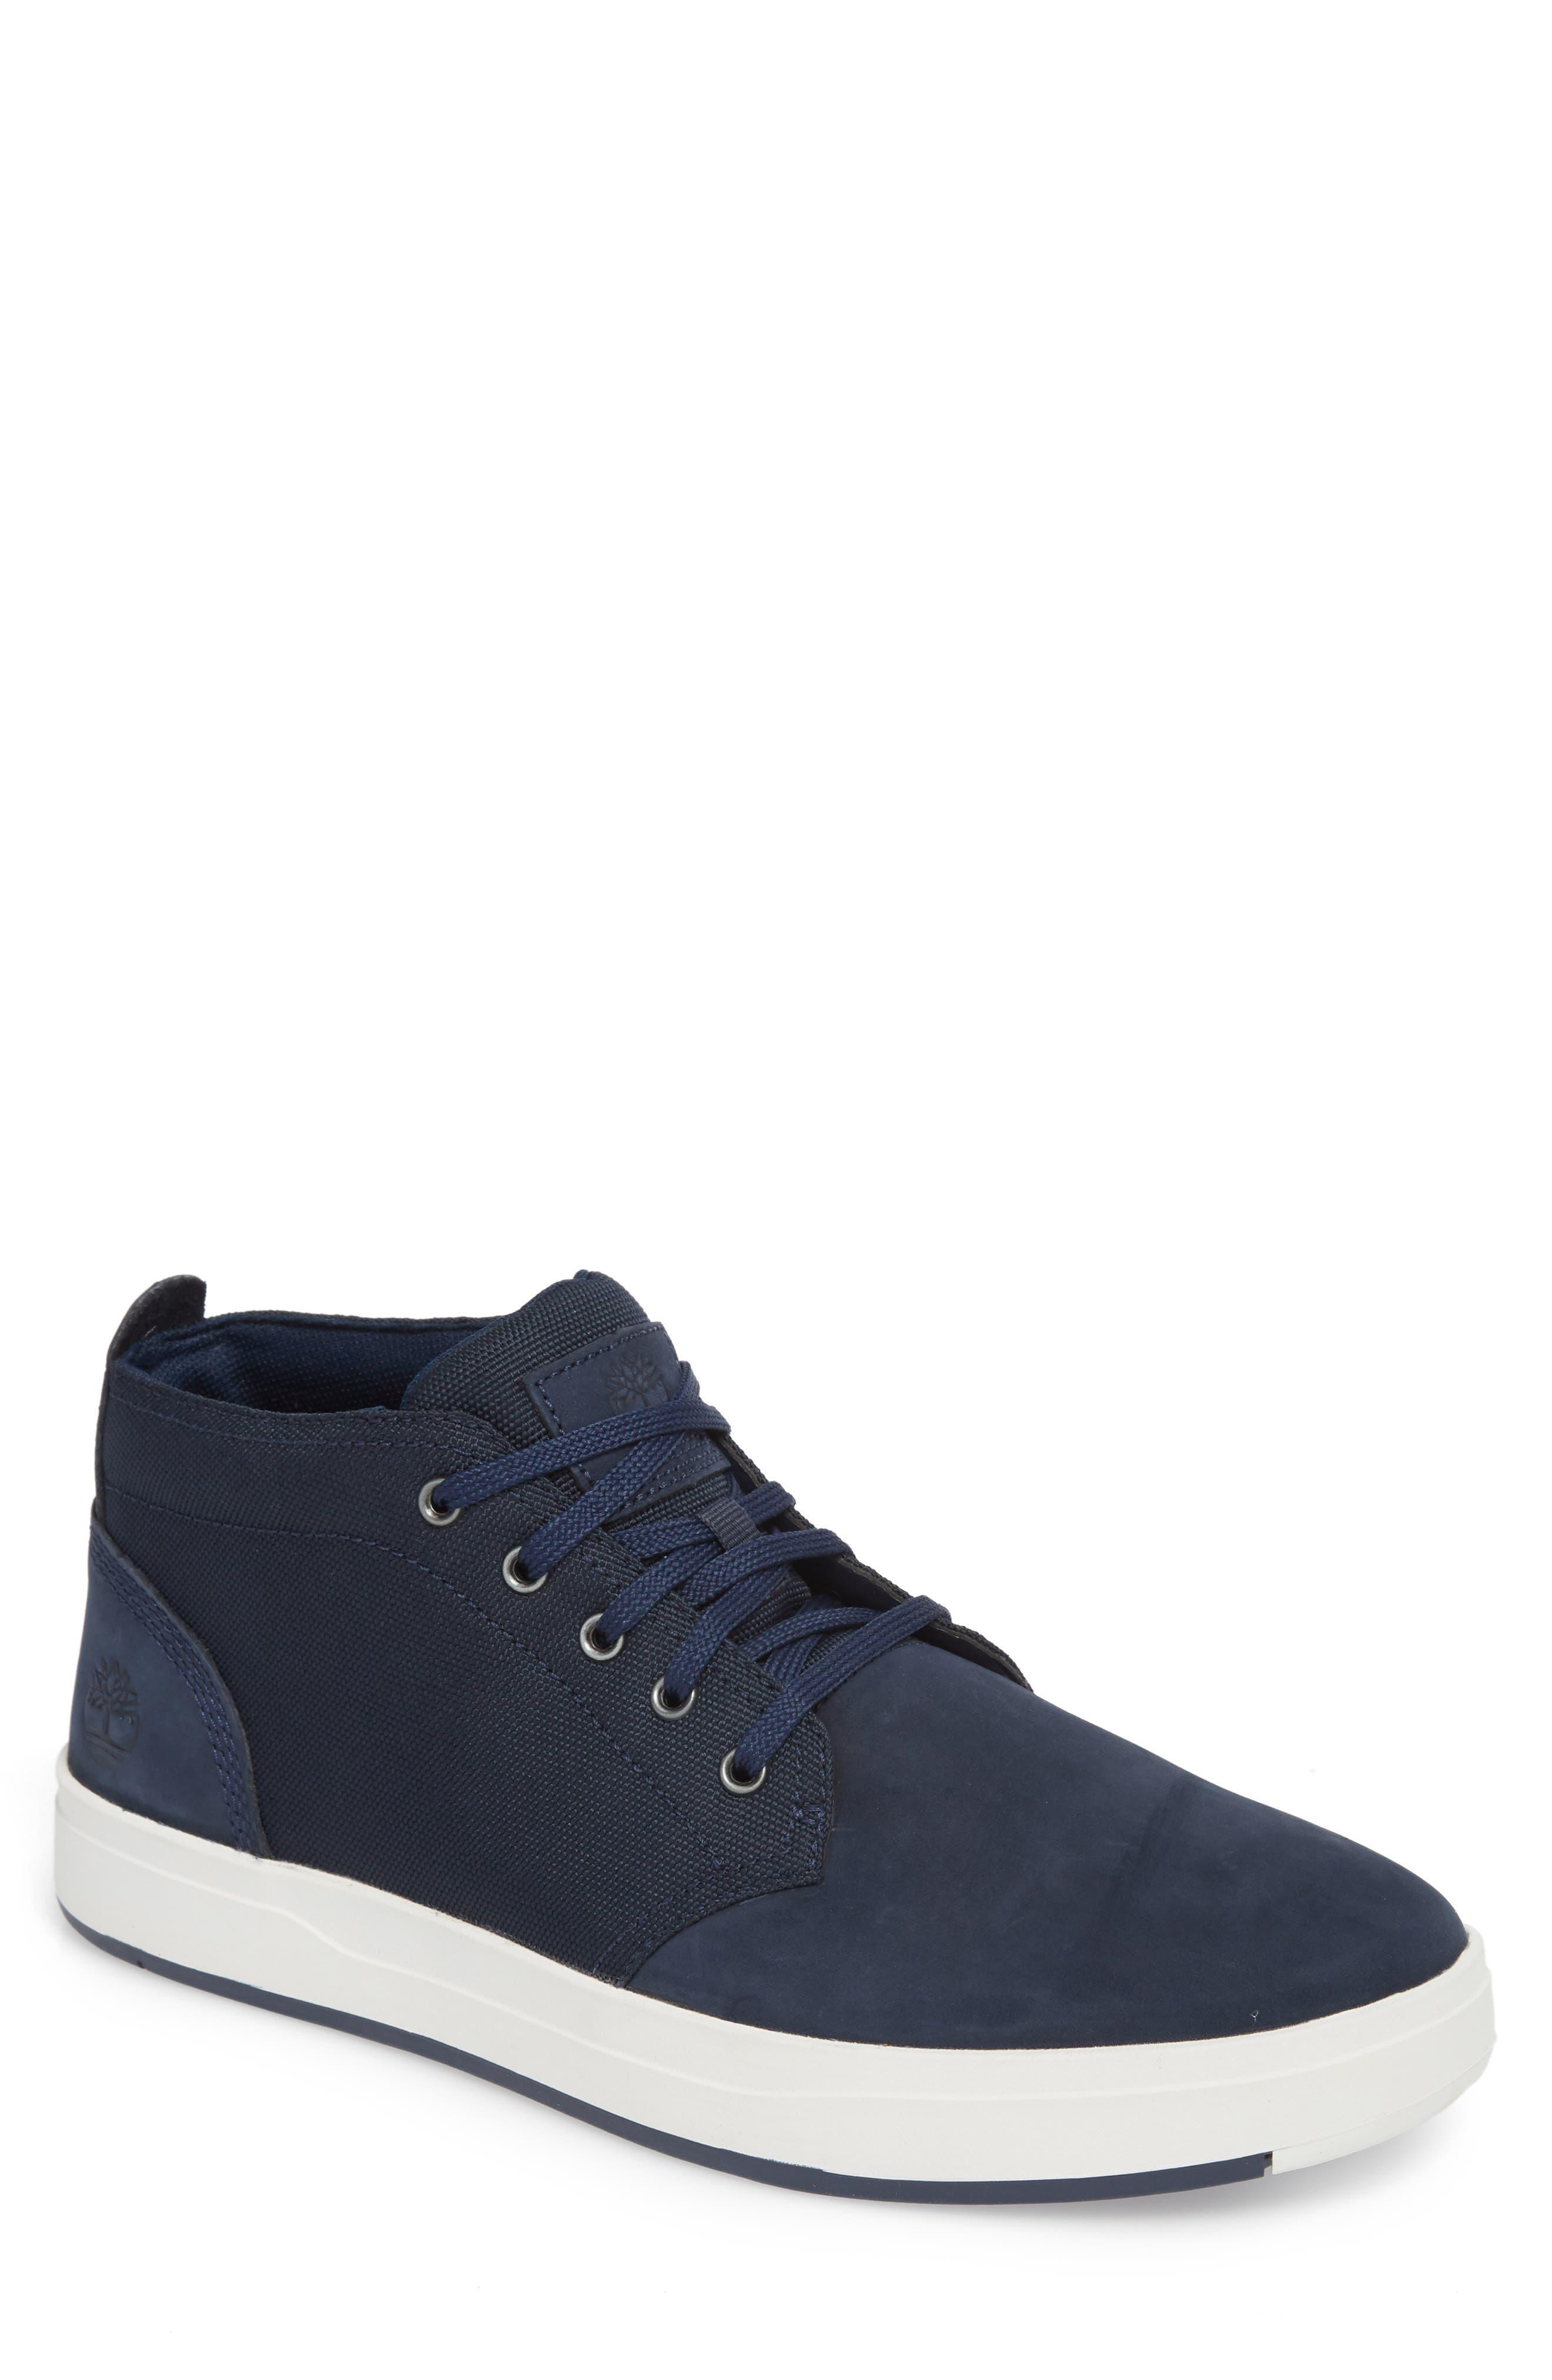 Davis Square Mid Top Sneaker,                         Main,                         color, Black/ Blue